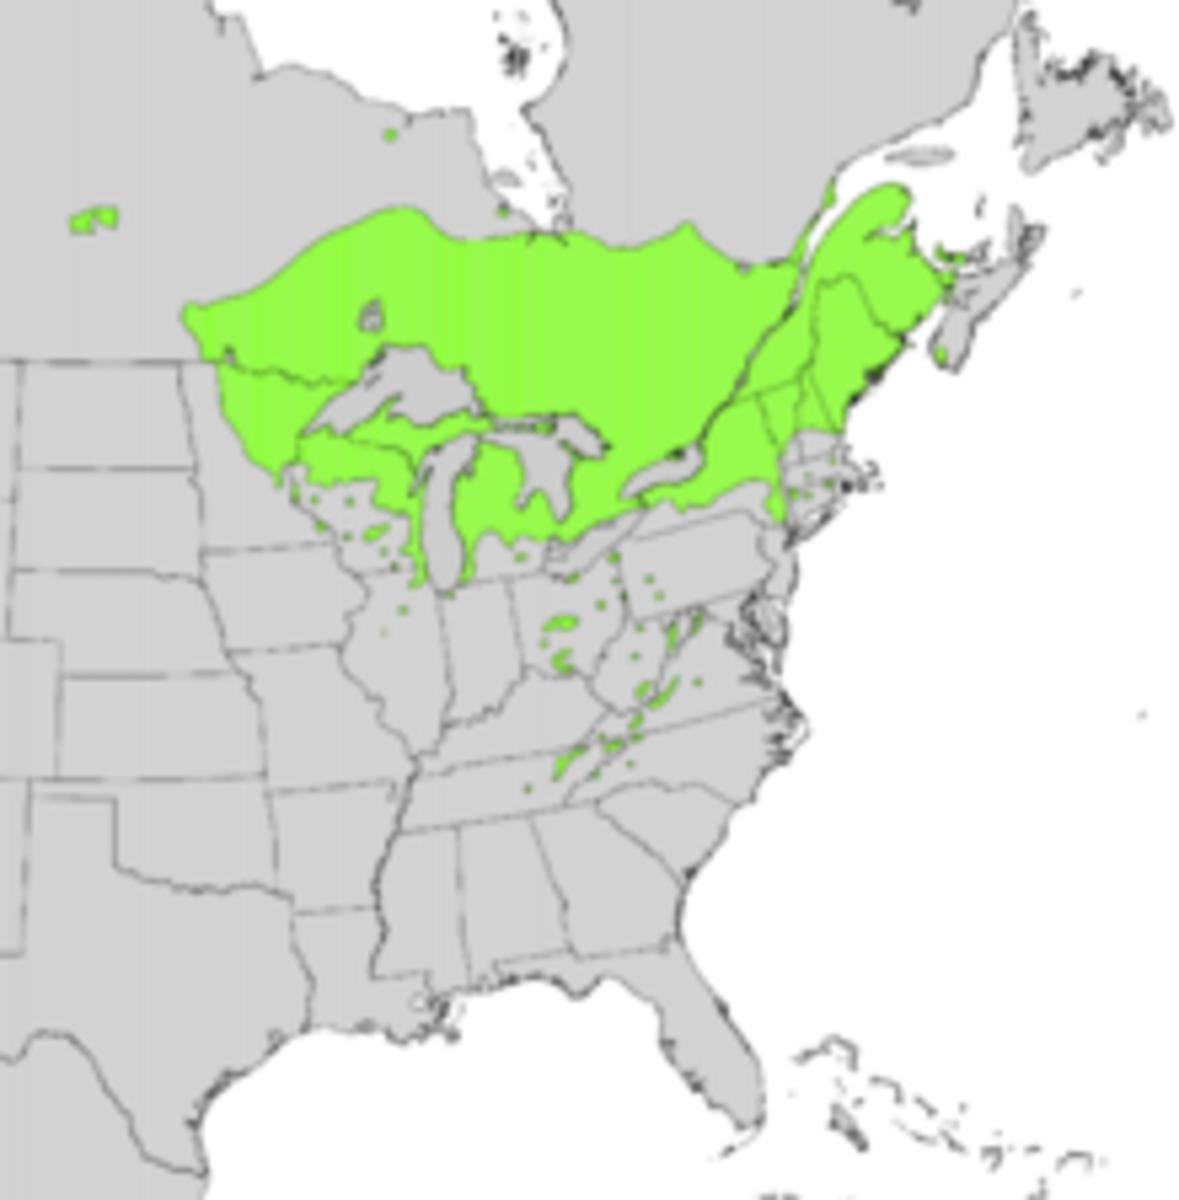 NORTHERN WHITE CEDAR NATURAL RANGE